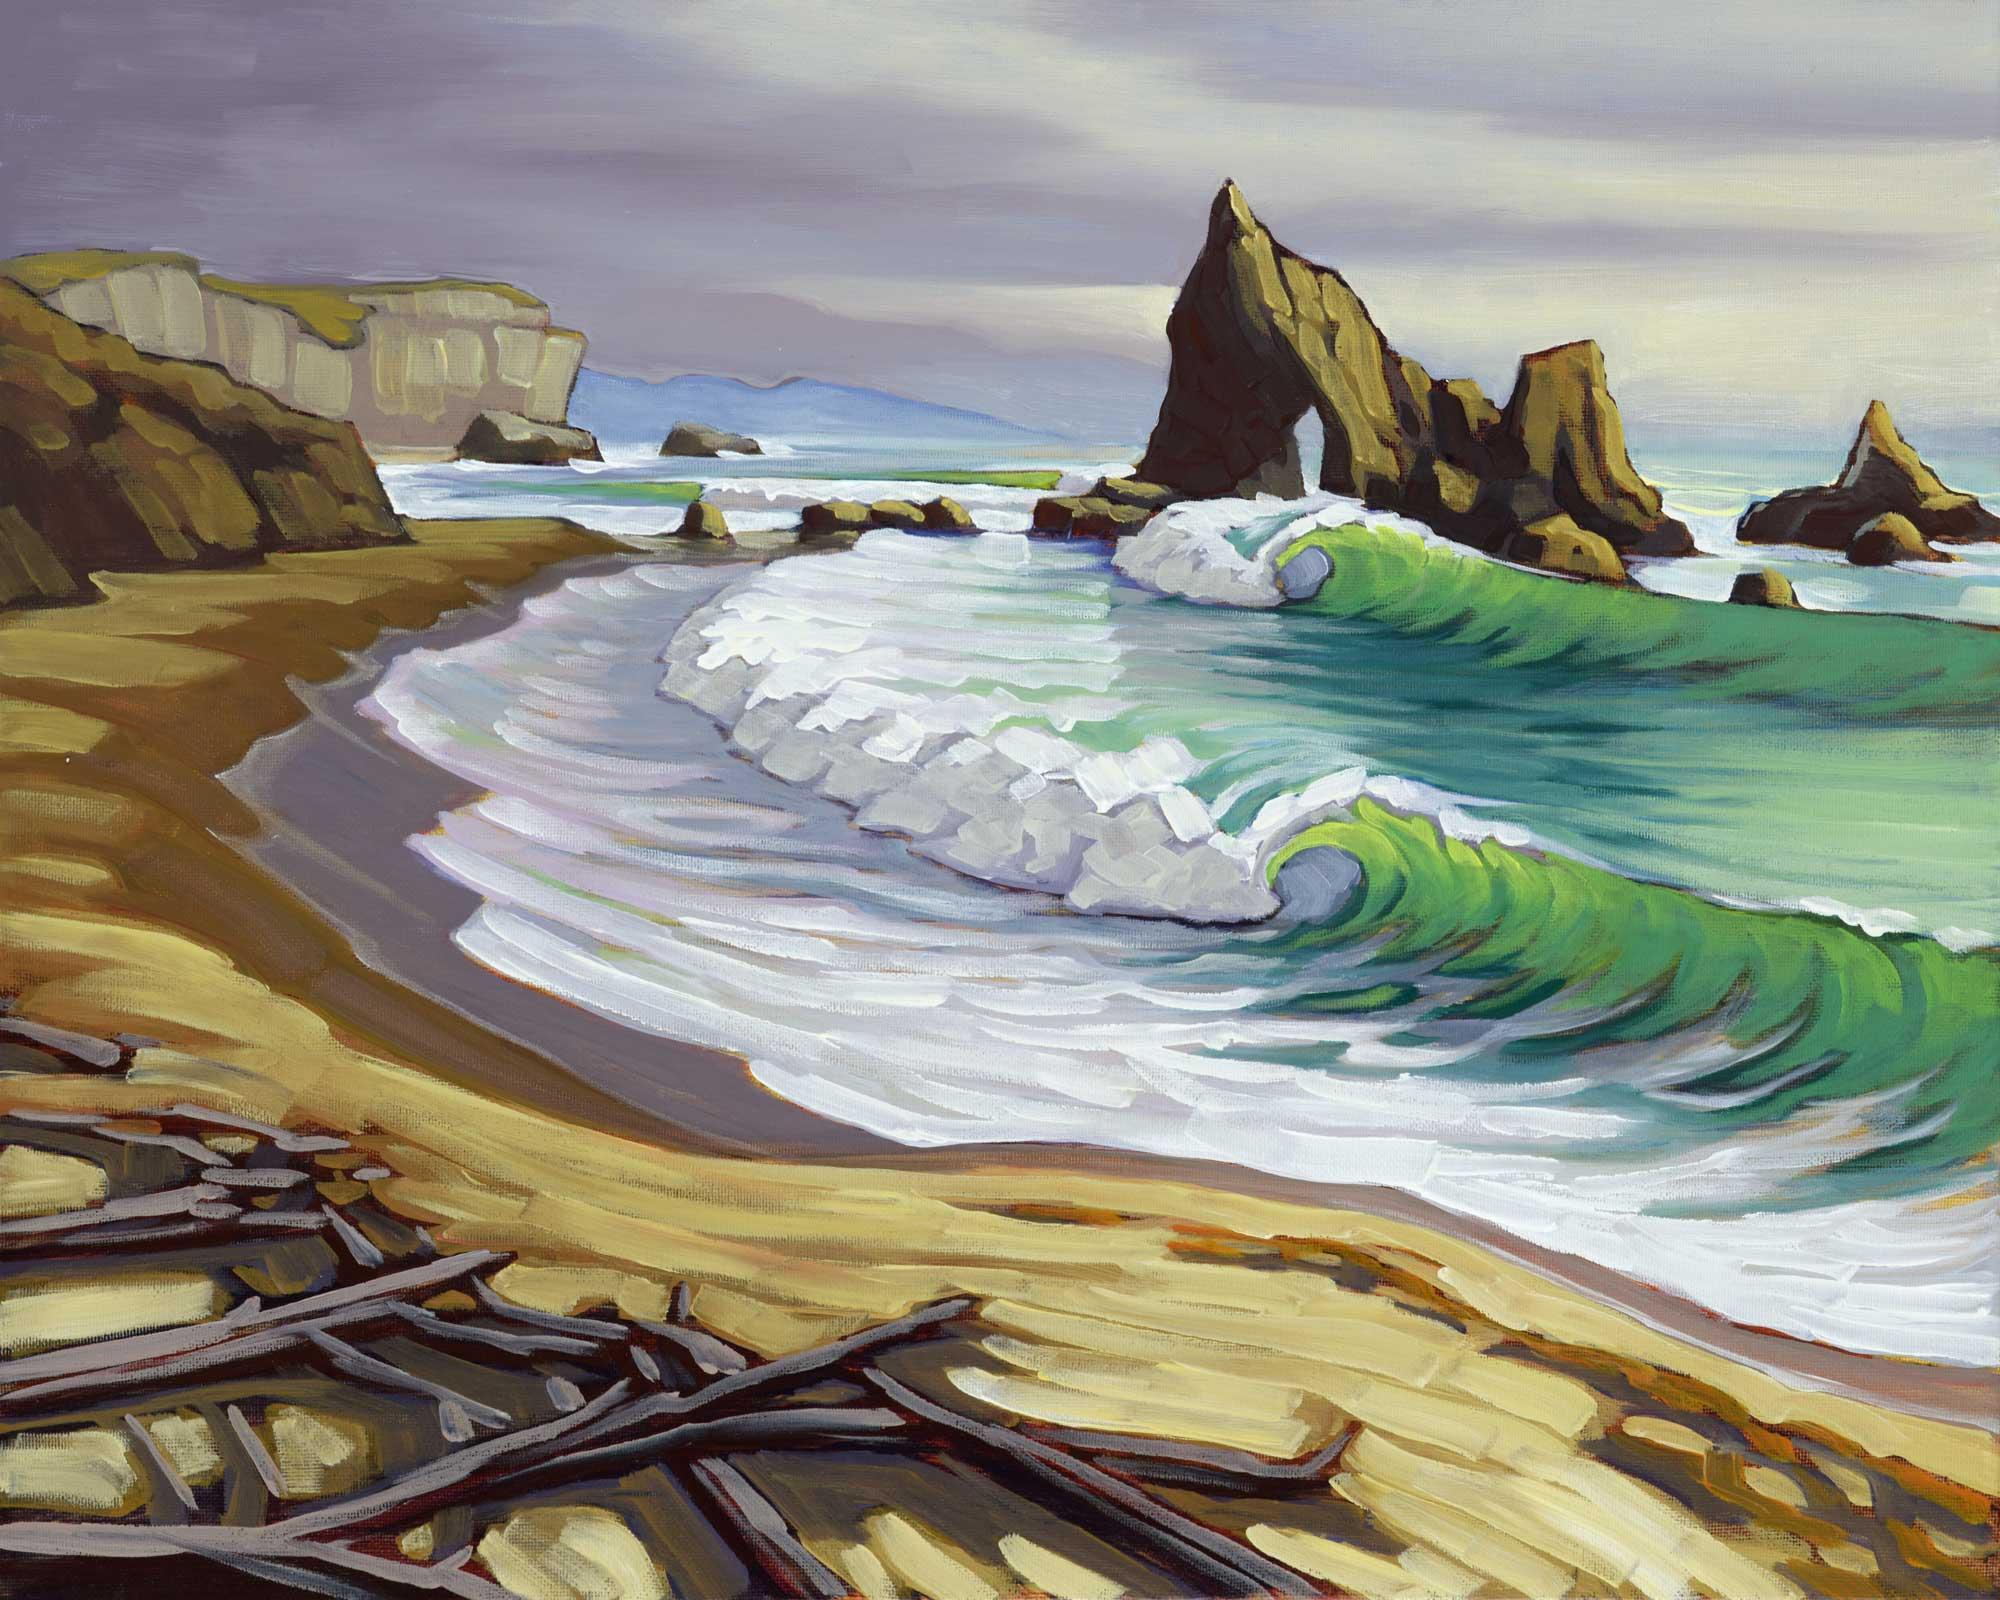 Plein air artwork from Martin's Beach on the San Mateo coast of Central California